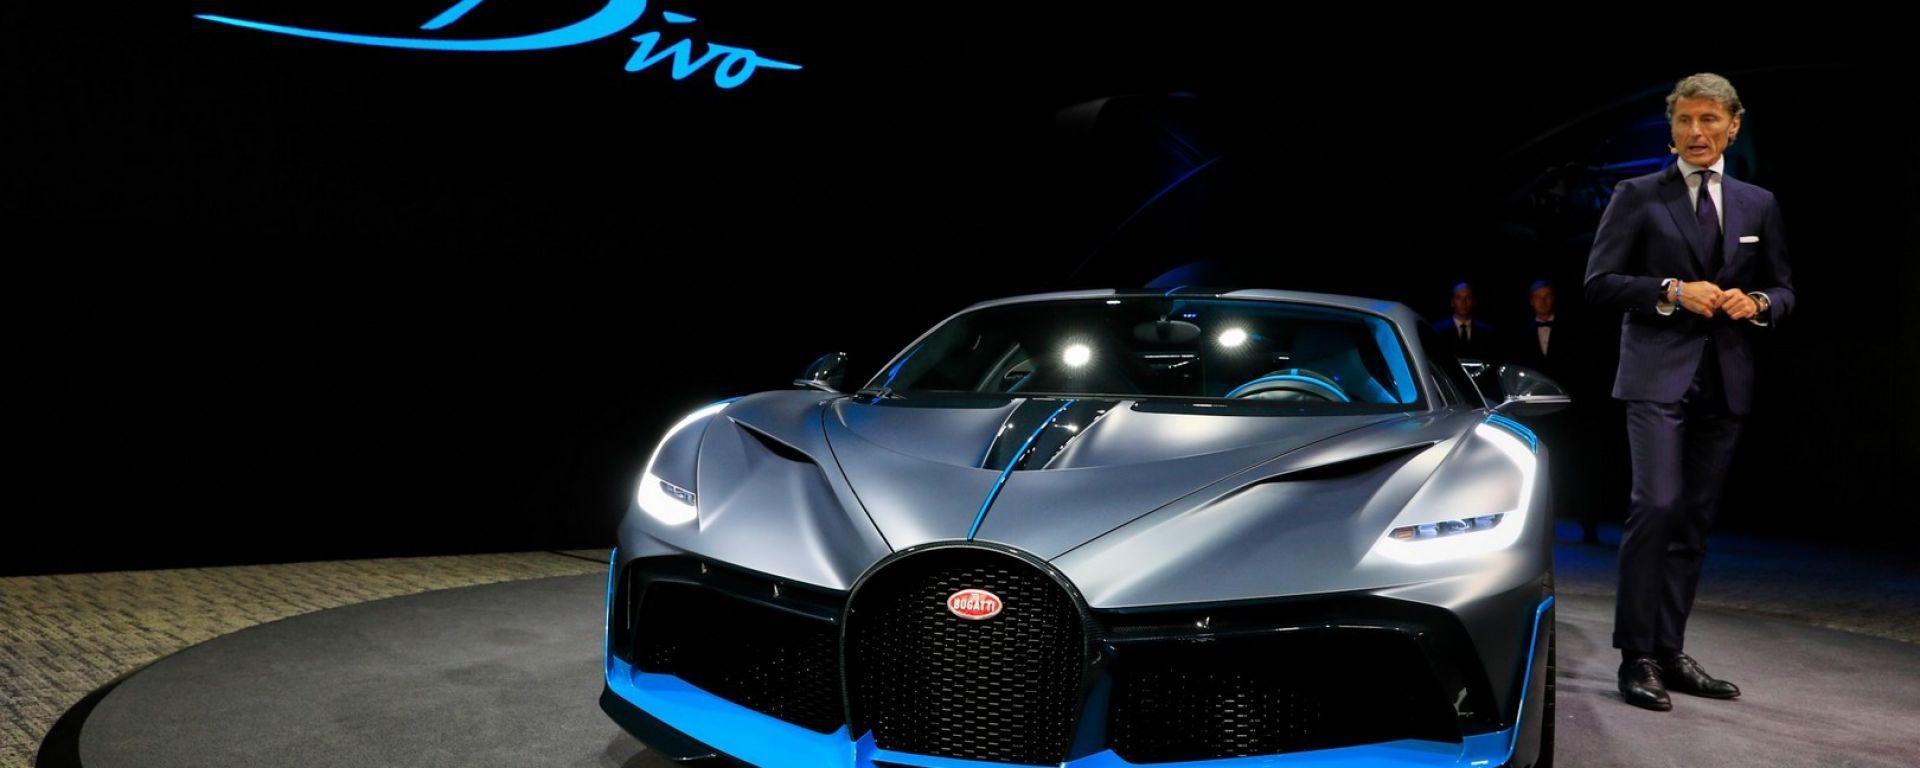 Bugatti Divo: l'auto da 5 milioni di euro in video da Parigi